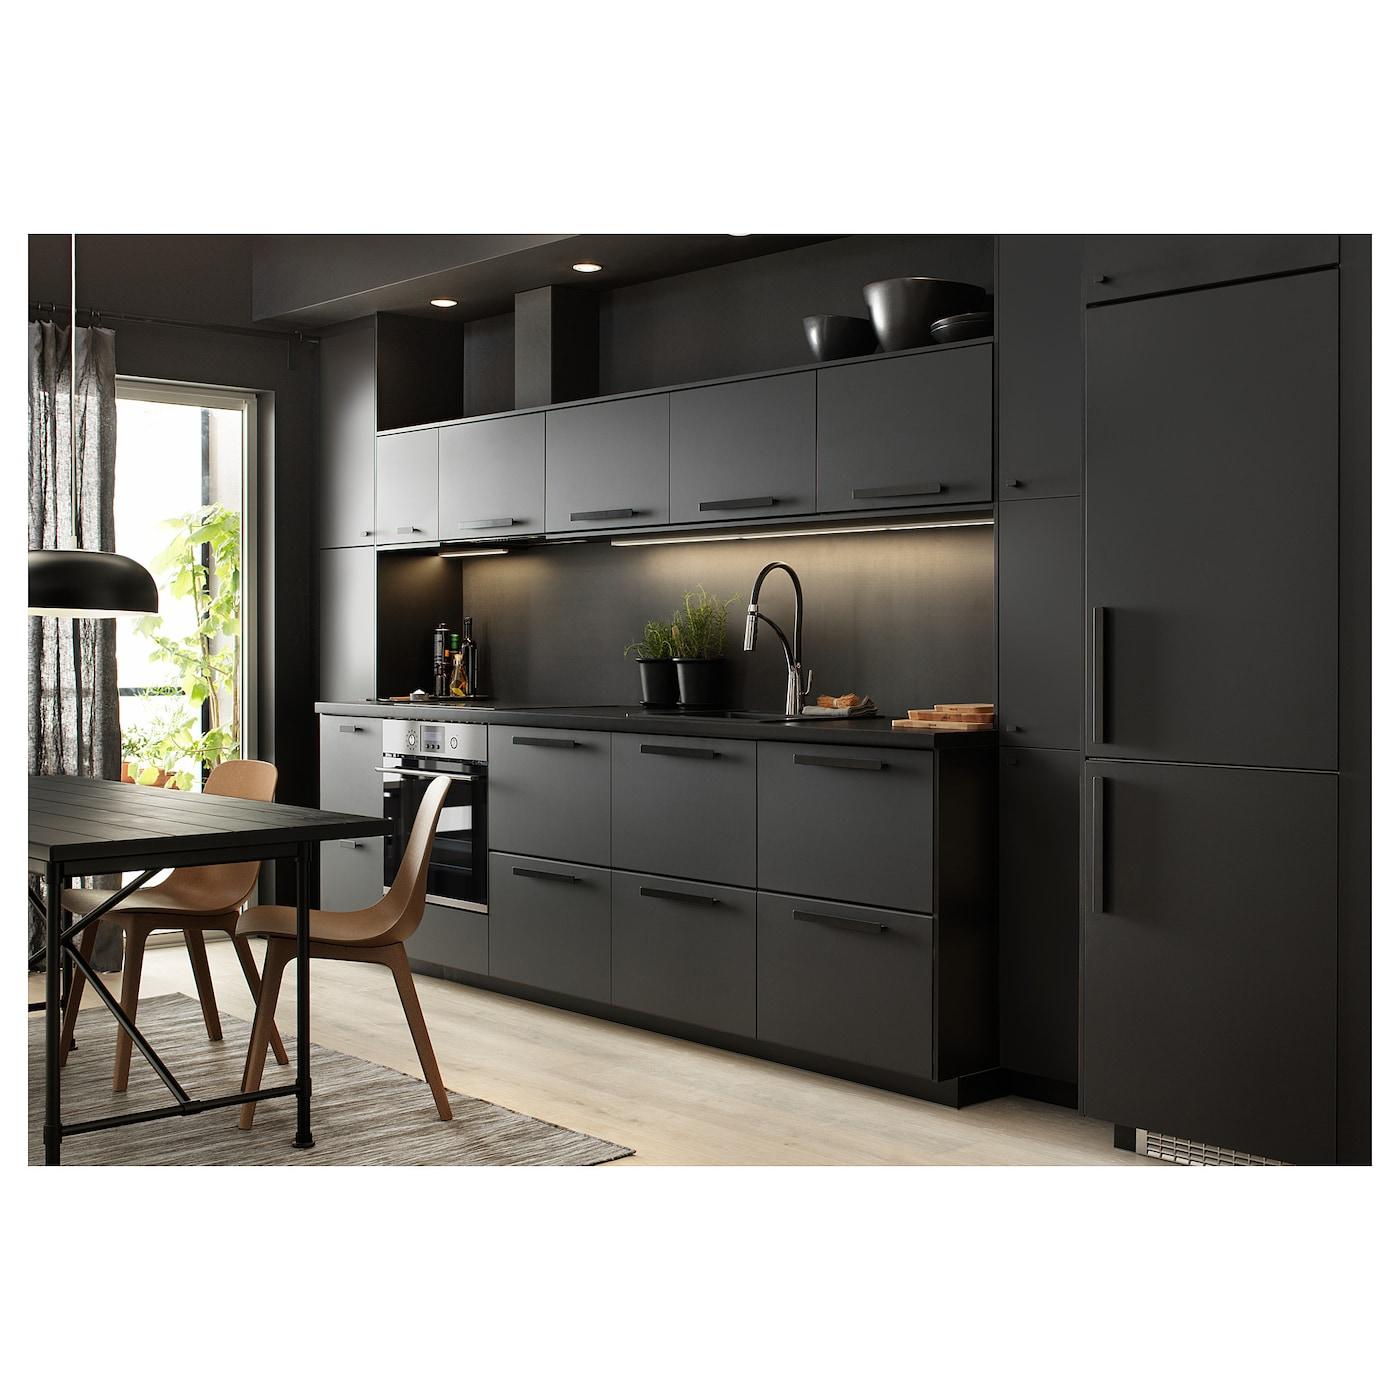 Alesk r grifo de cocina con ducha cromado negro ikea - Grifo para cocina ...